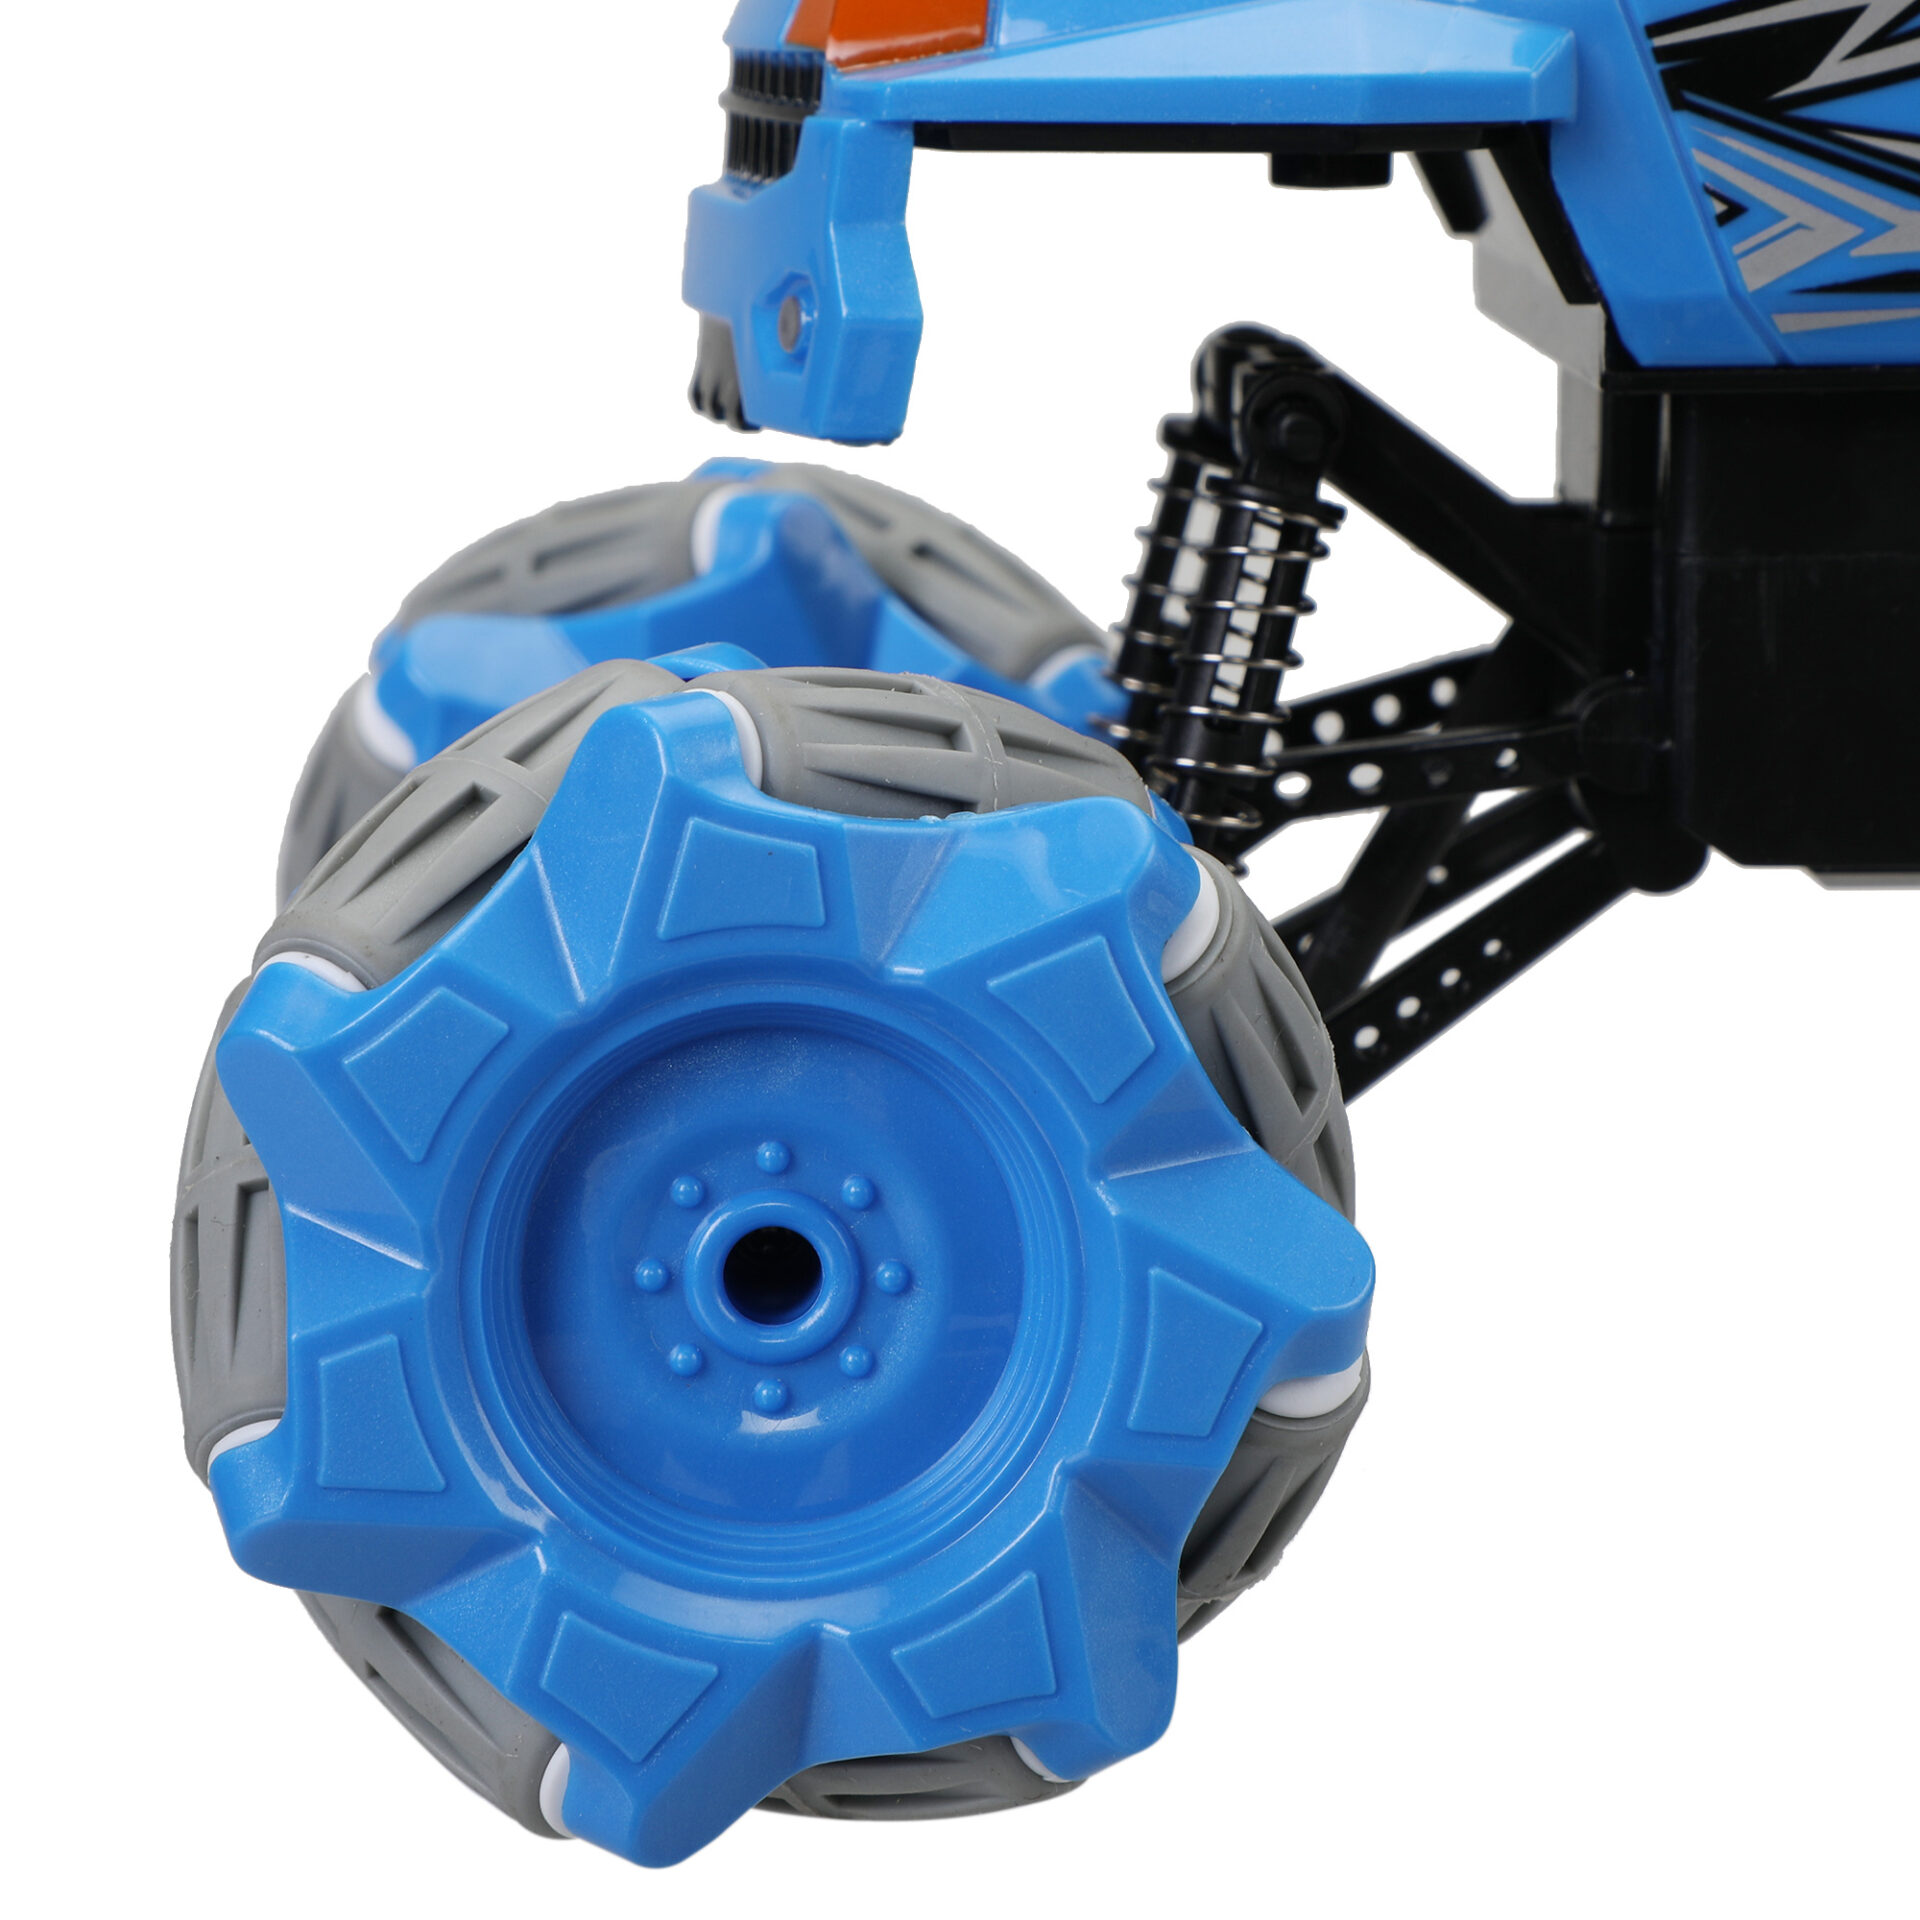 Gesture Sensing RC Stunt Car for Kids, Blue 6 4